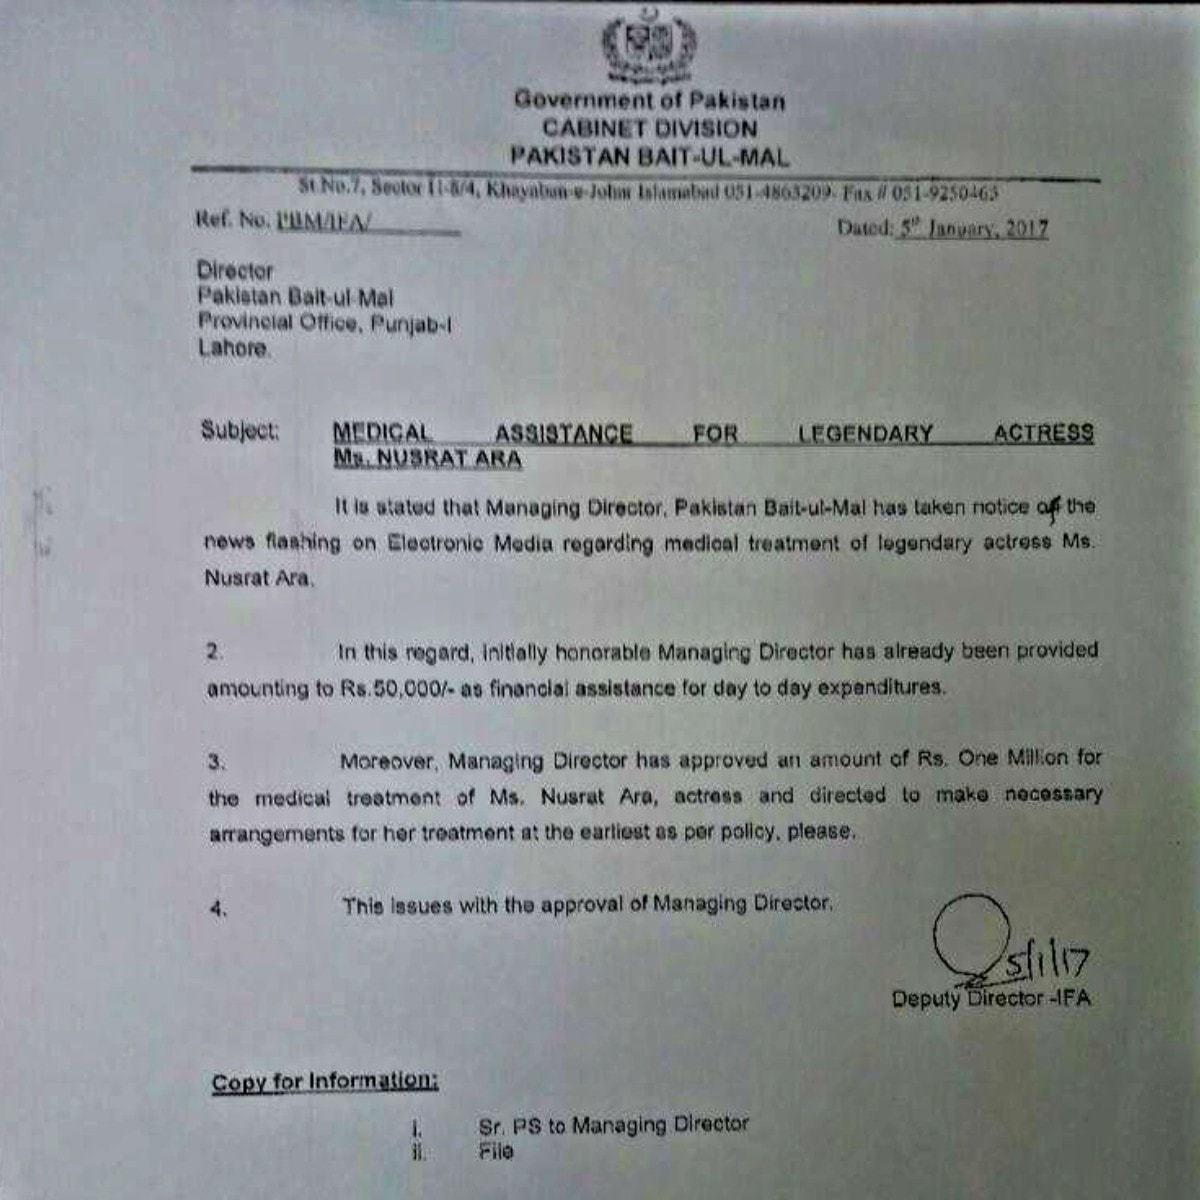 Pakistan Baitul Mal has pledged Rs10 lacs for Nusrat Ara's treatment